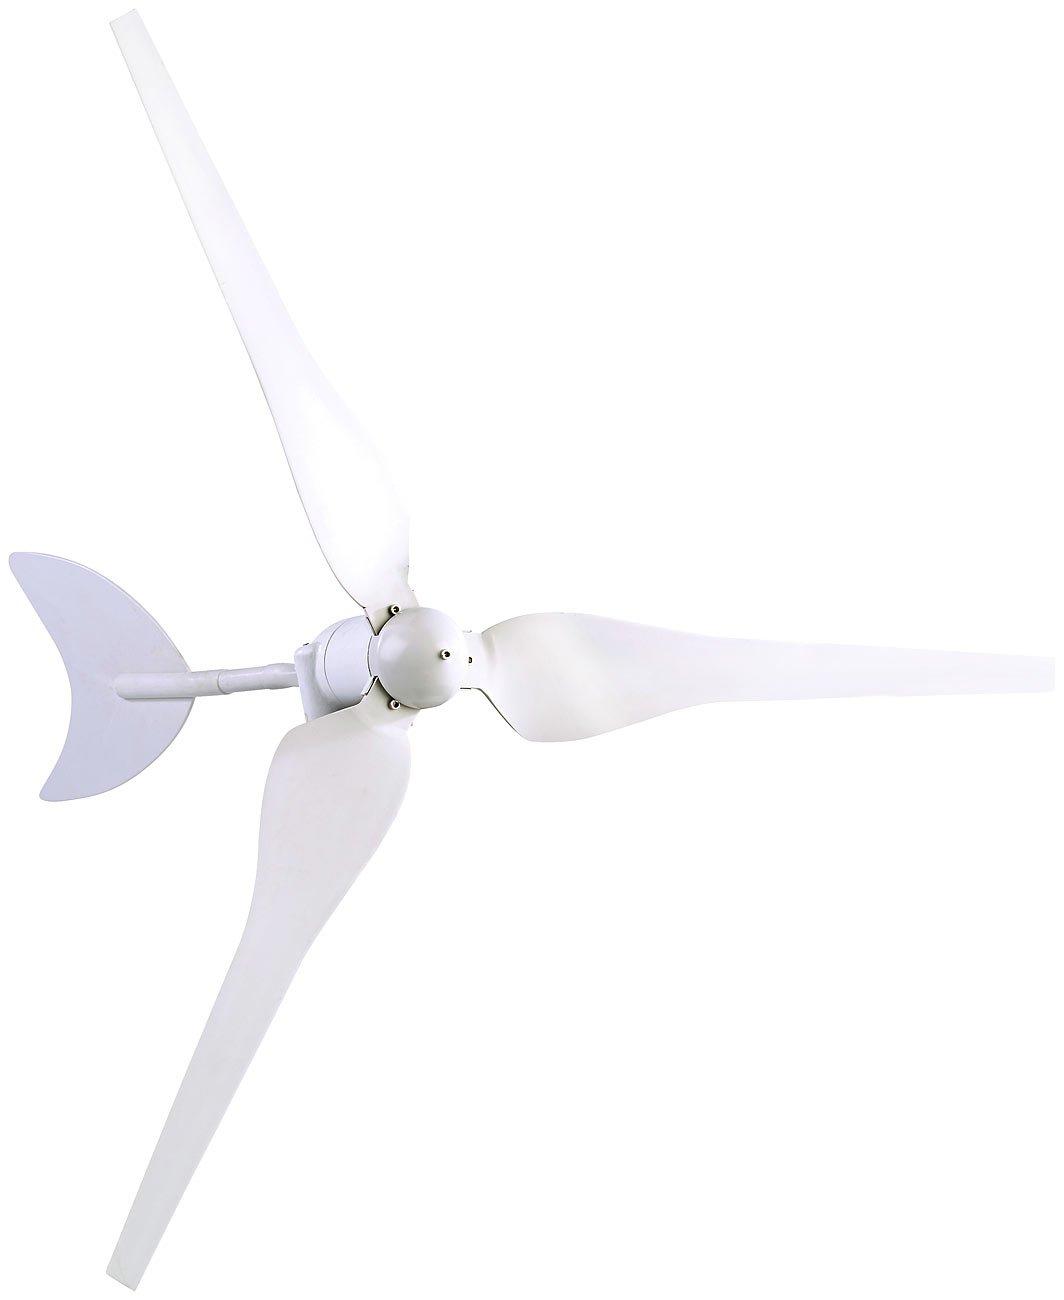 revolt Windgenerator für 12-Volt-Systeme, 50 Watt